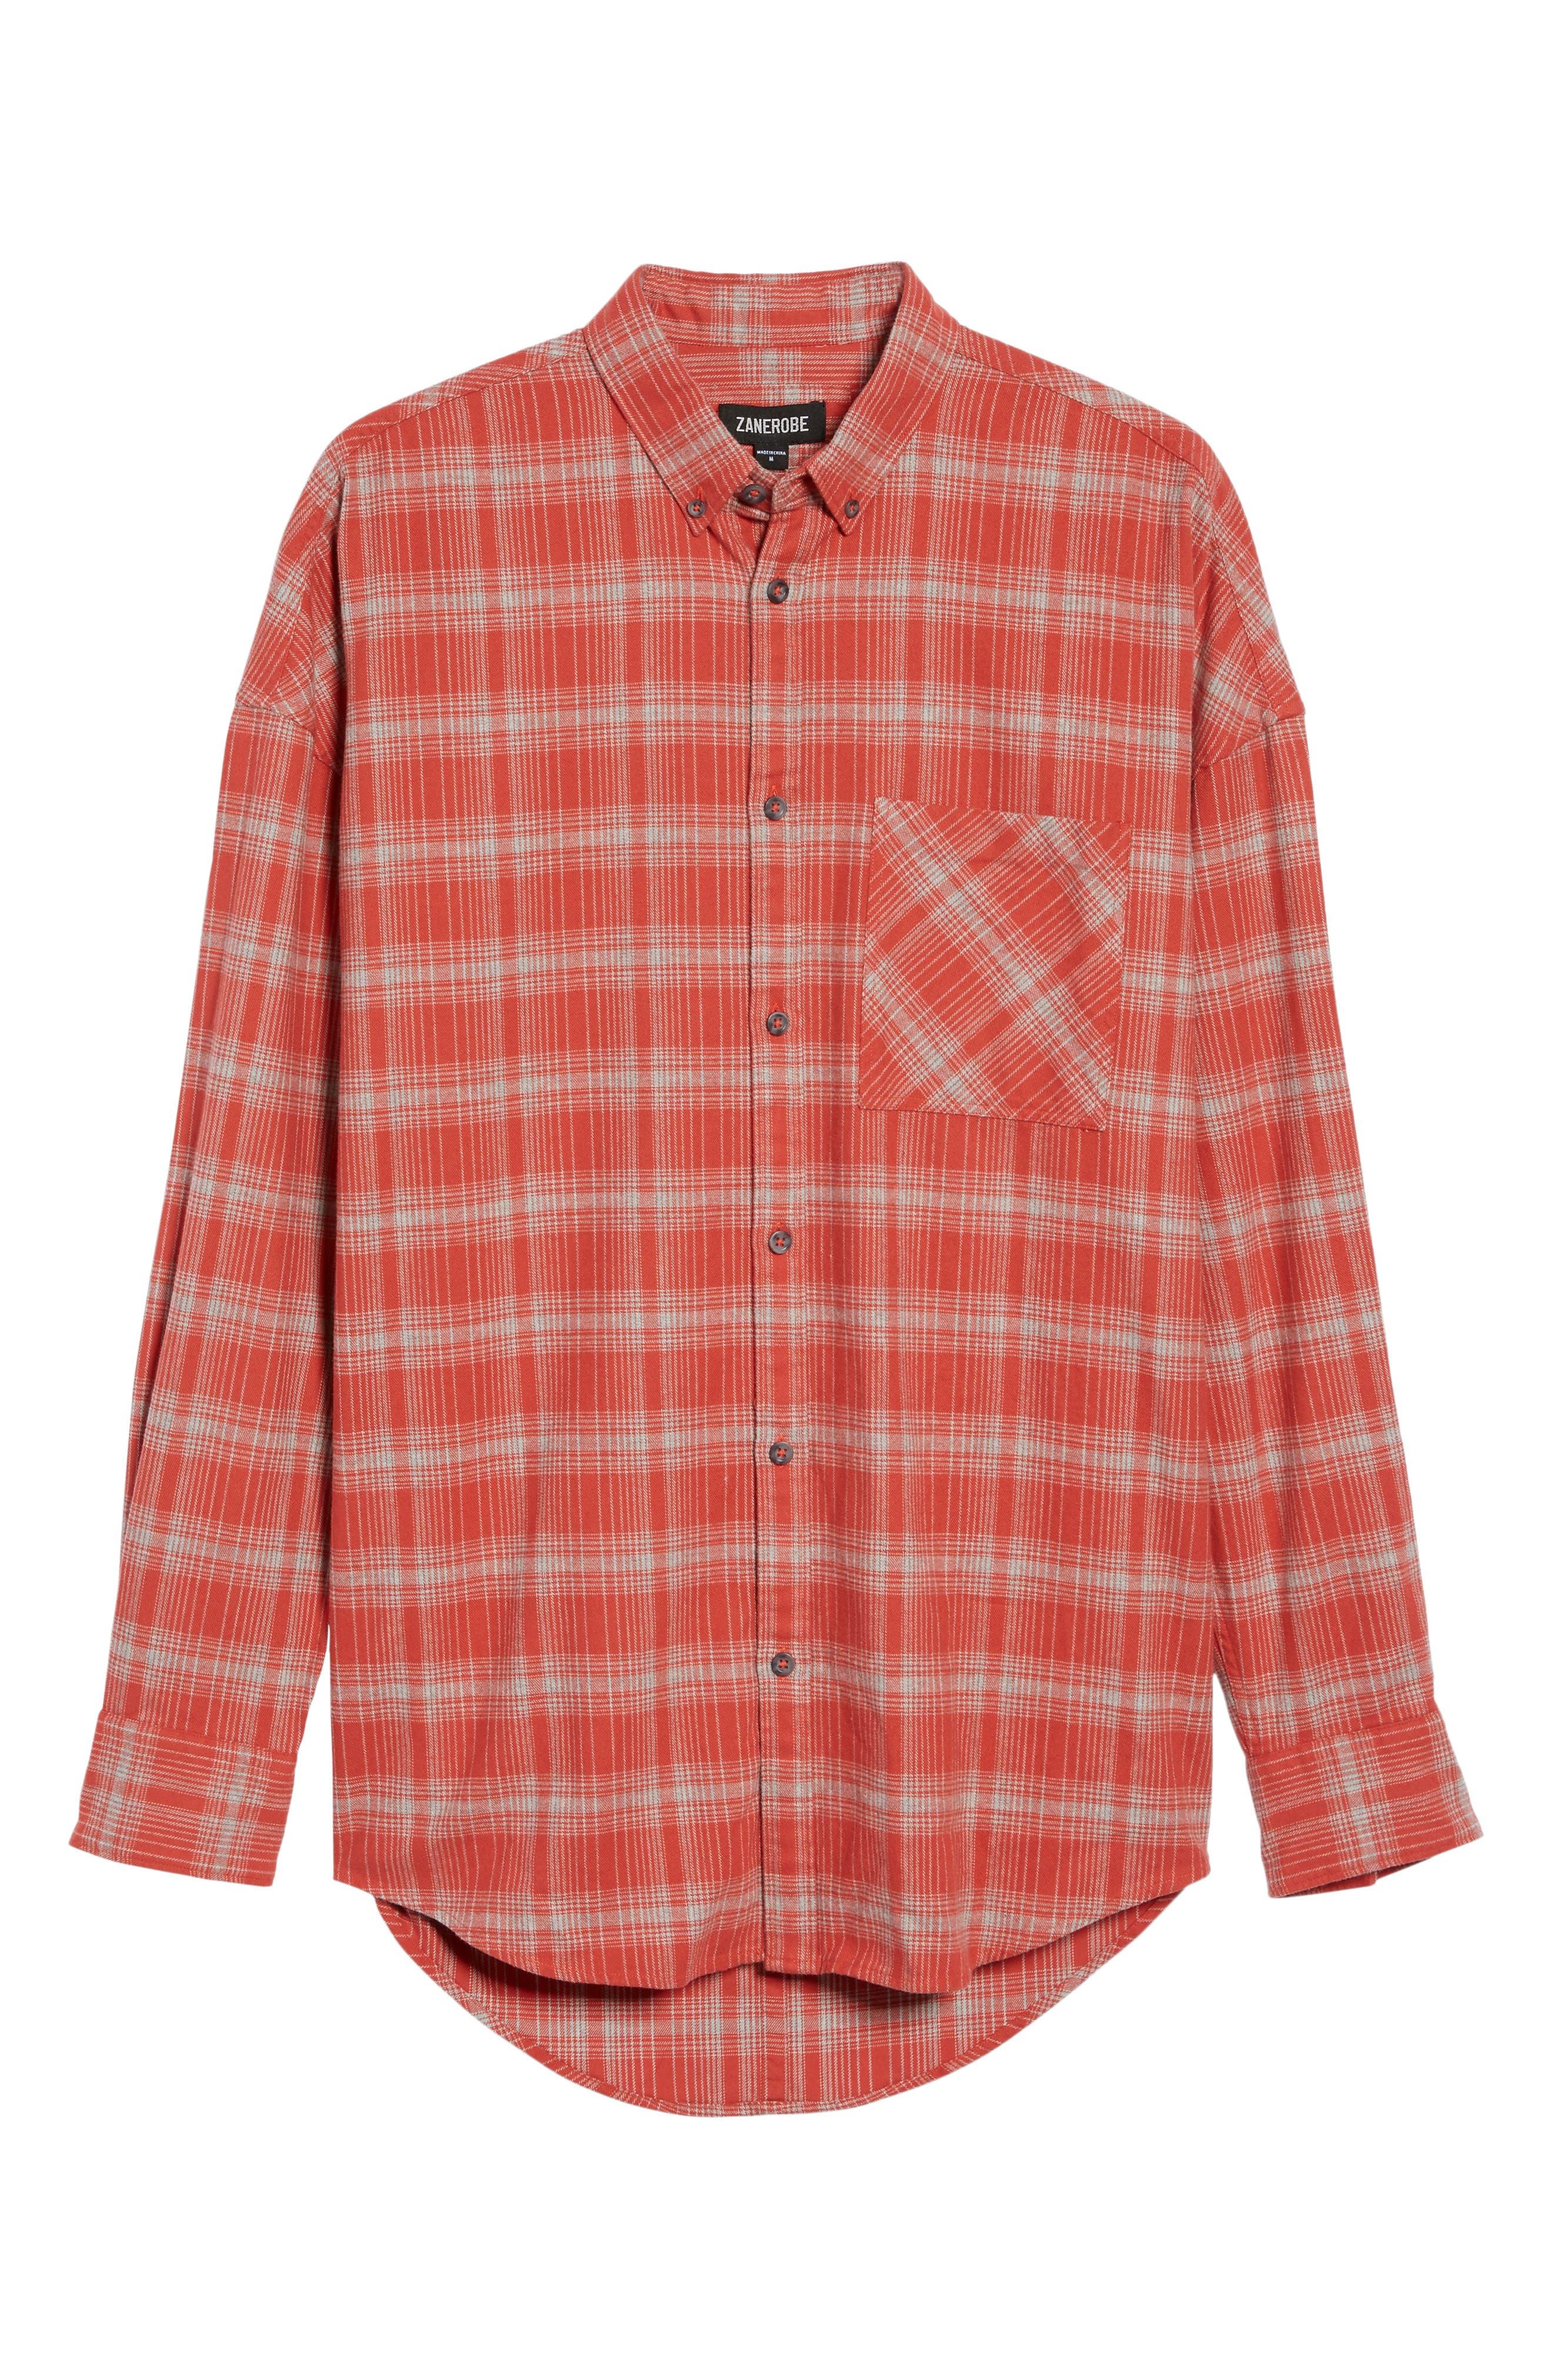 Rugger Plaid Sport Shirt,                             Alternate thumbnail 4, color,                             641